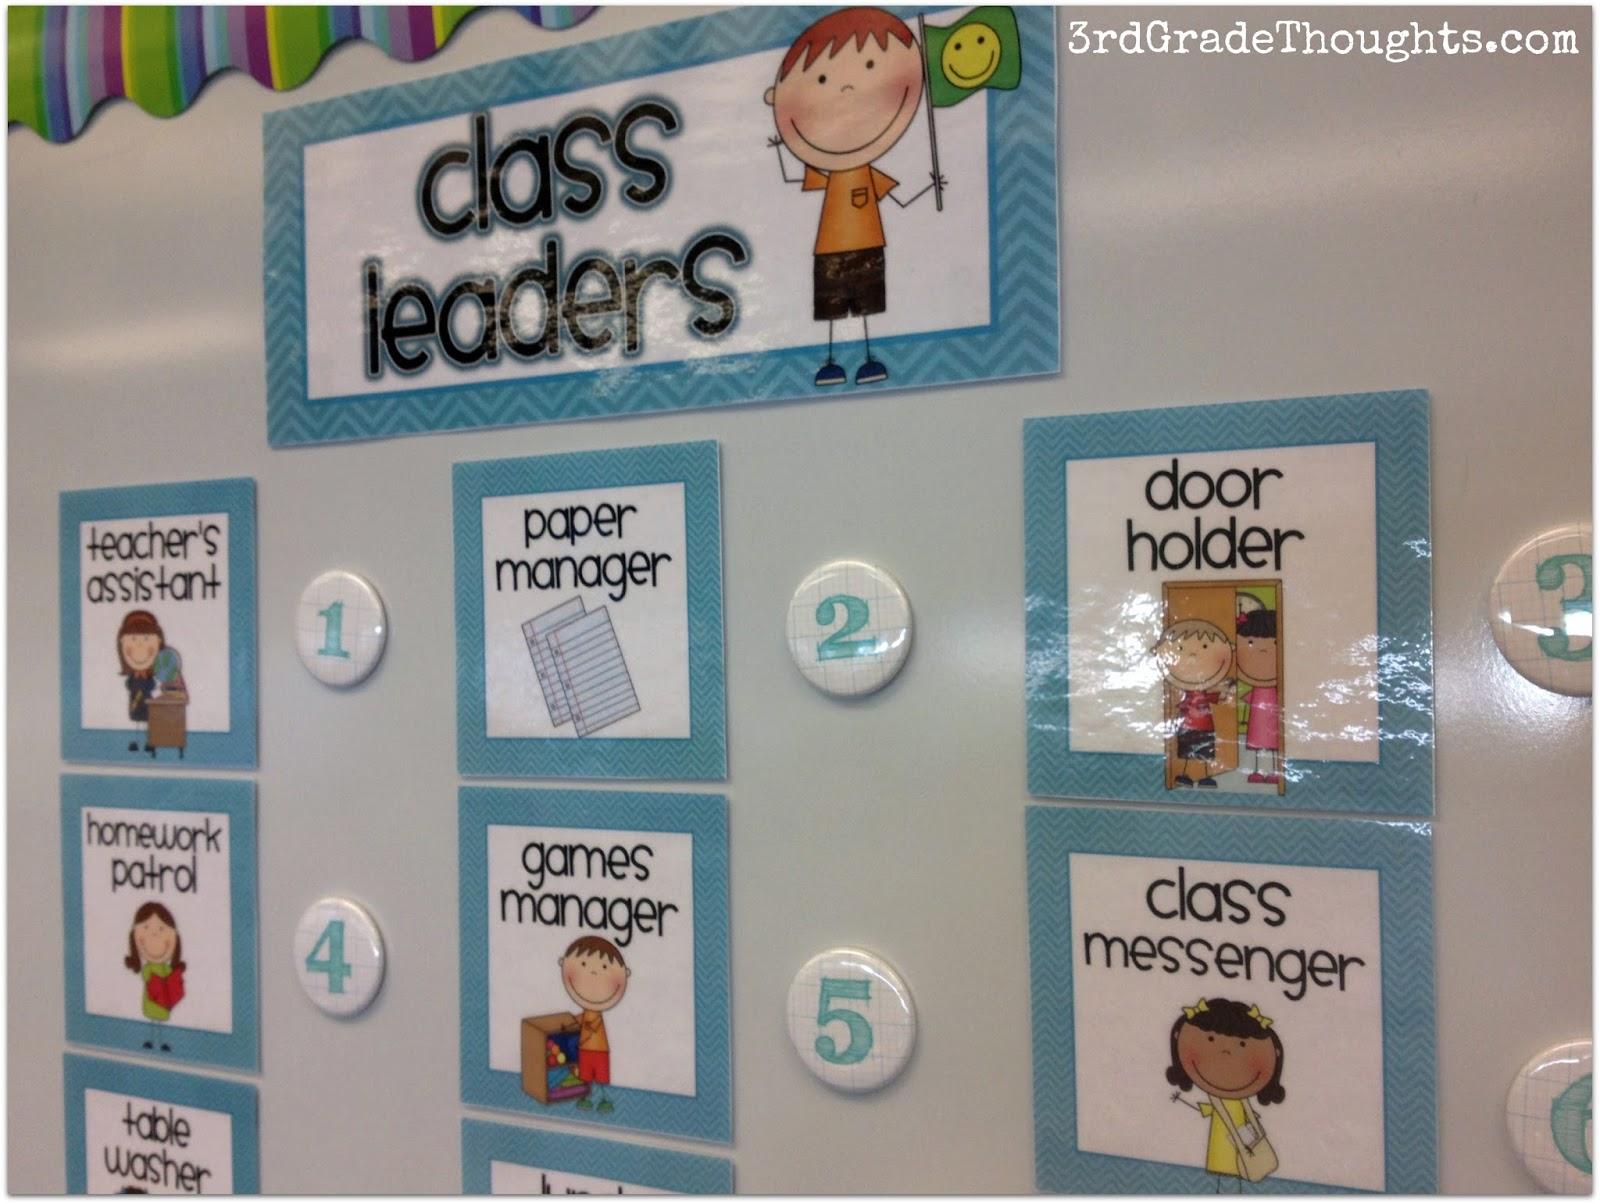 Classroom Job Class Greeter